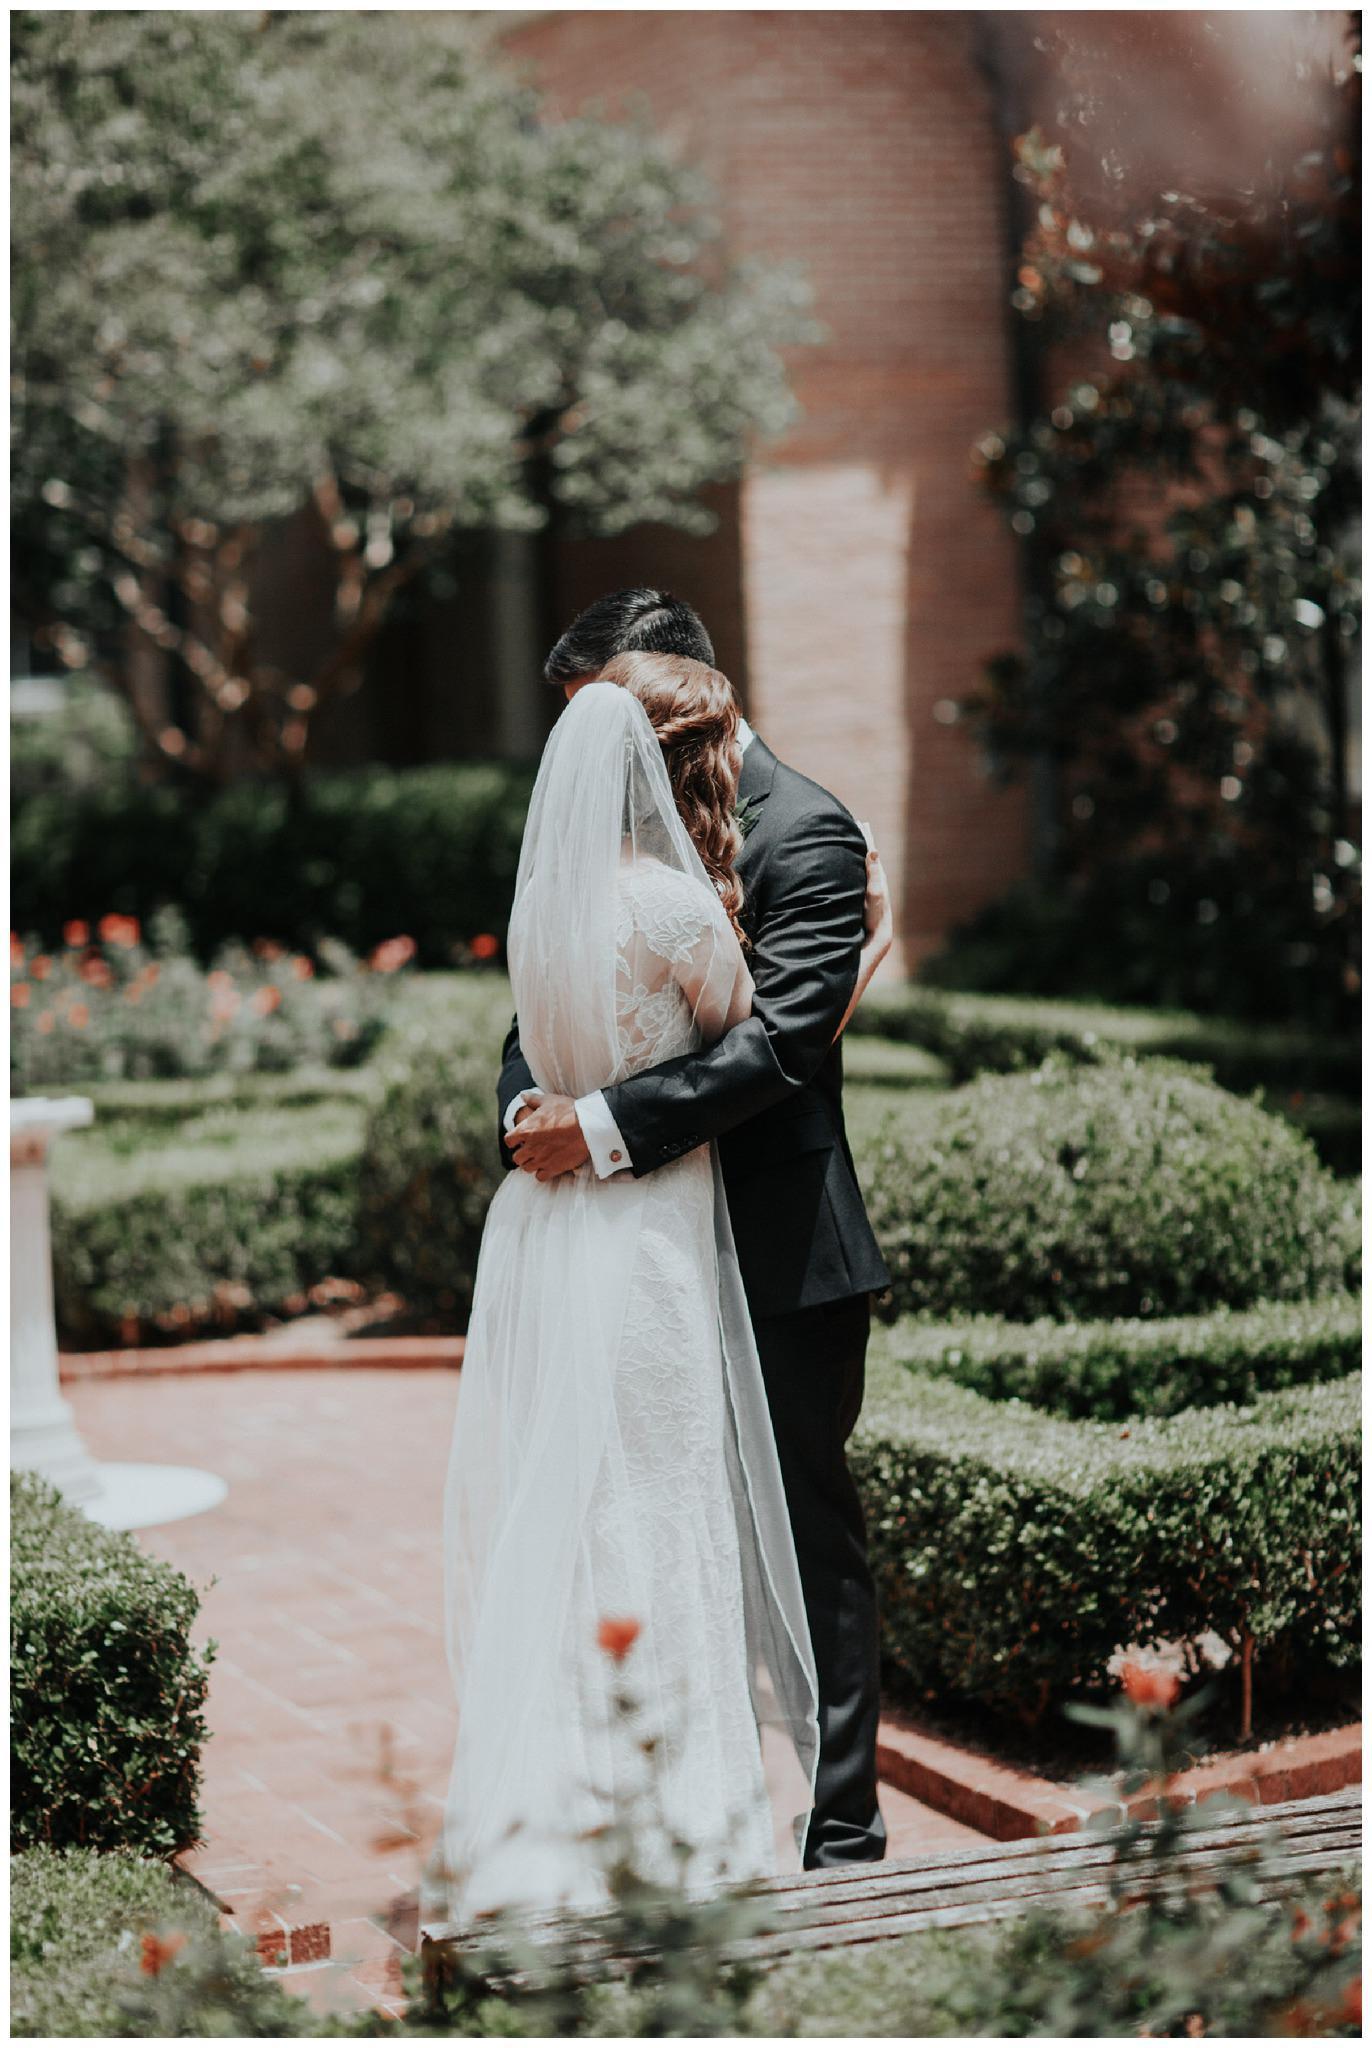 Wedding at the Junior League Houston Texas  - Madeleine Frost-2138.jpg